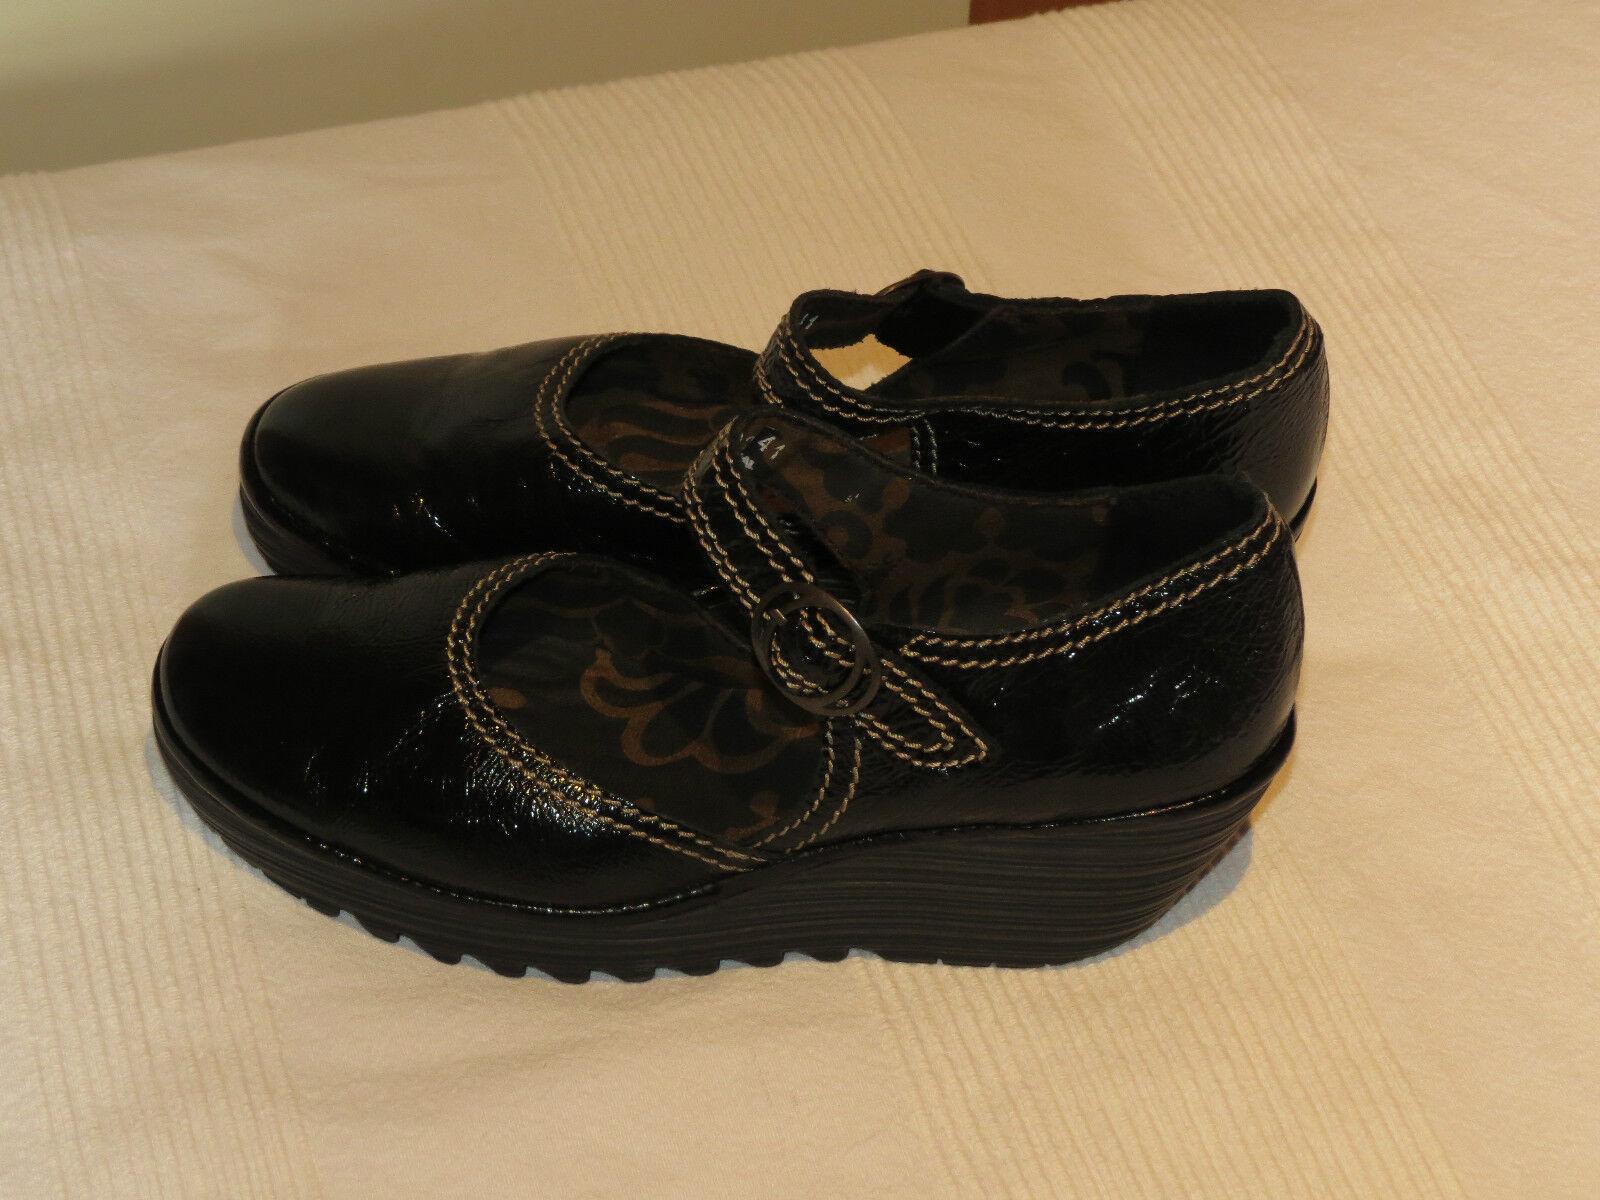 FLY LONDON YERBA BLACK PATENT LEATHER MARY JANE Schuhe UK 8 EUR 41 BNWOB